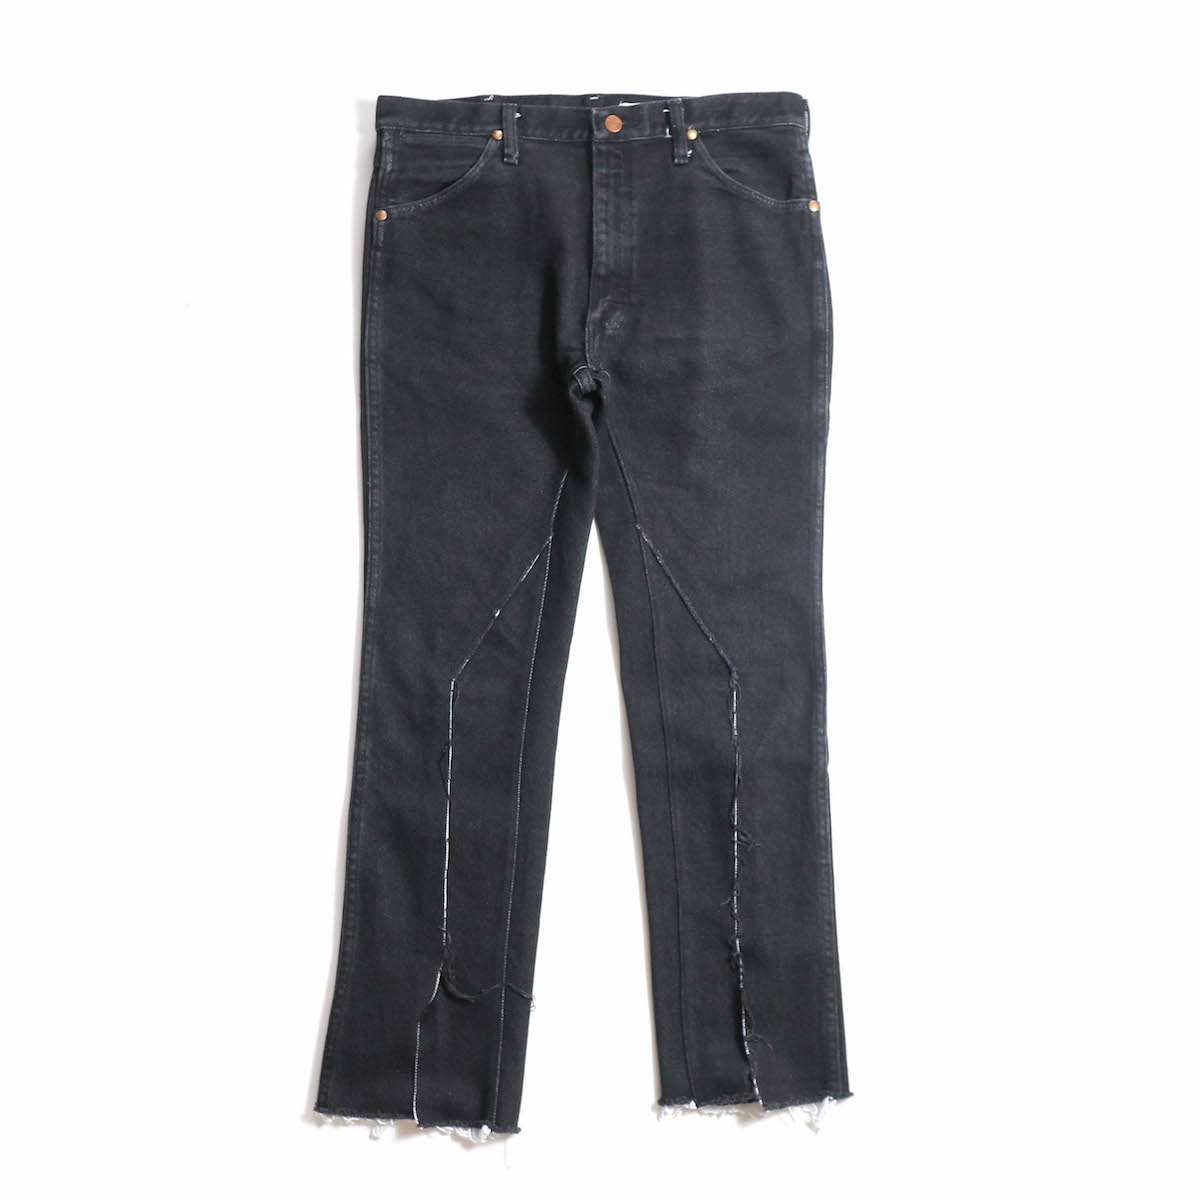 OLD PARK / SLIT JEANS -Wrangler (Msize)(c)